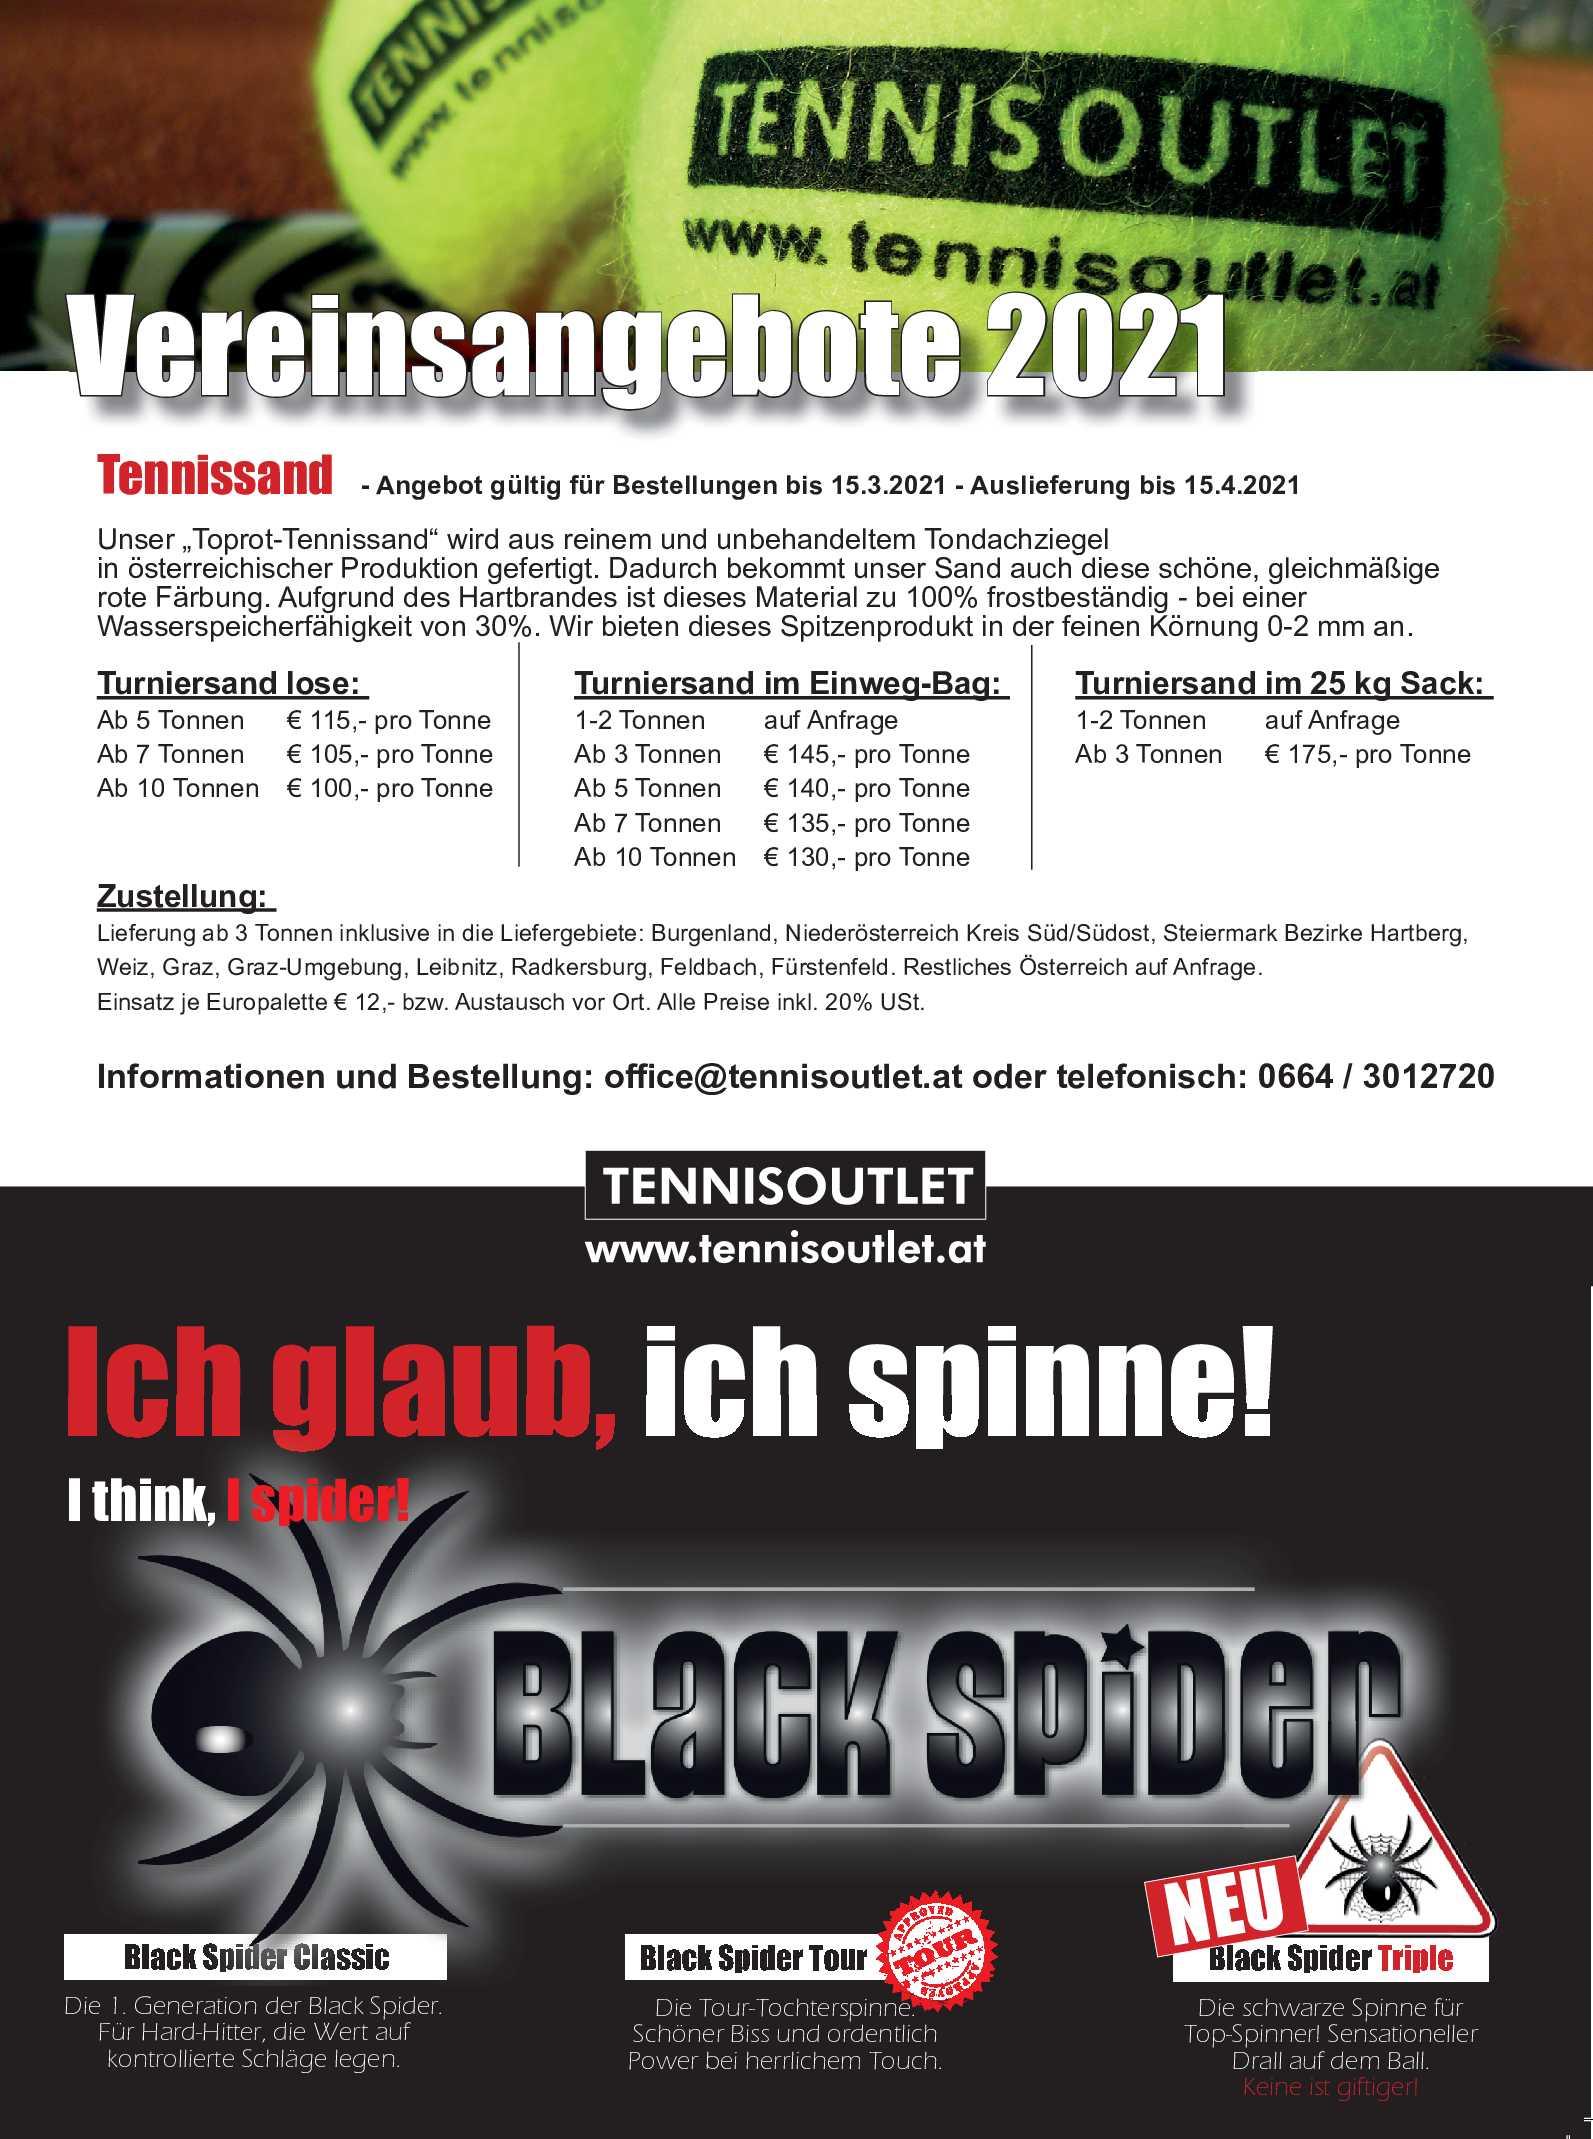 public/epaper/imported/20201209/kurier/magazin/magazin_20201209_089.jpg